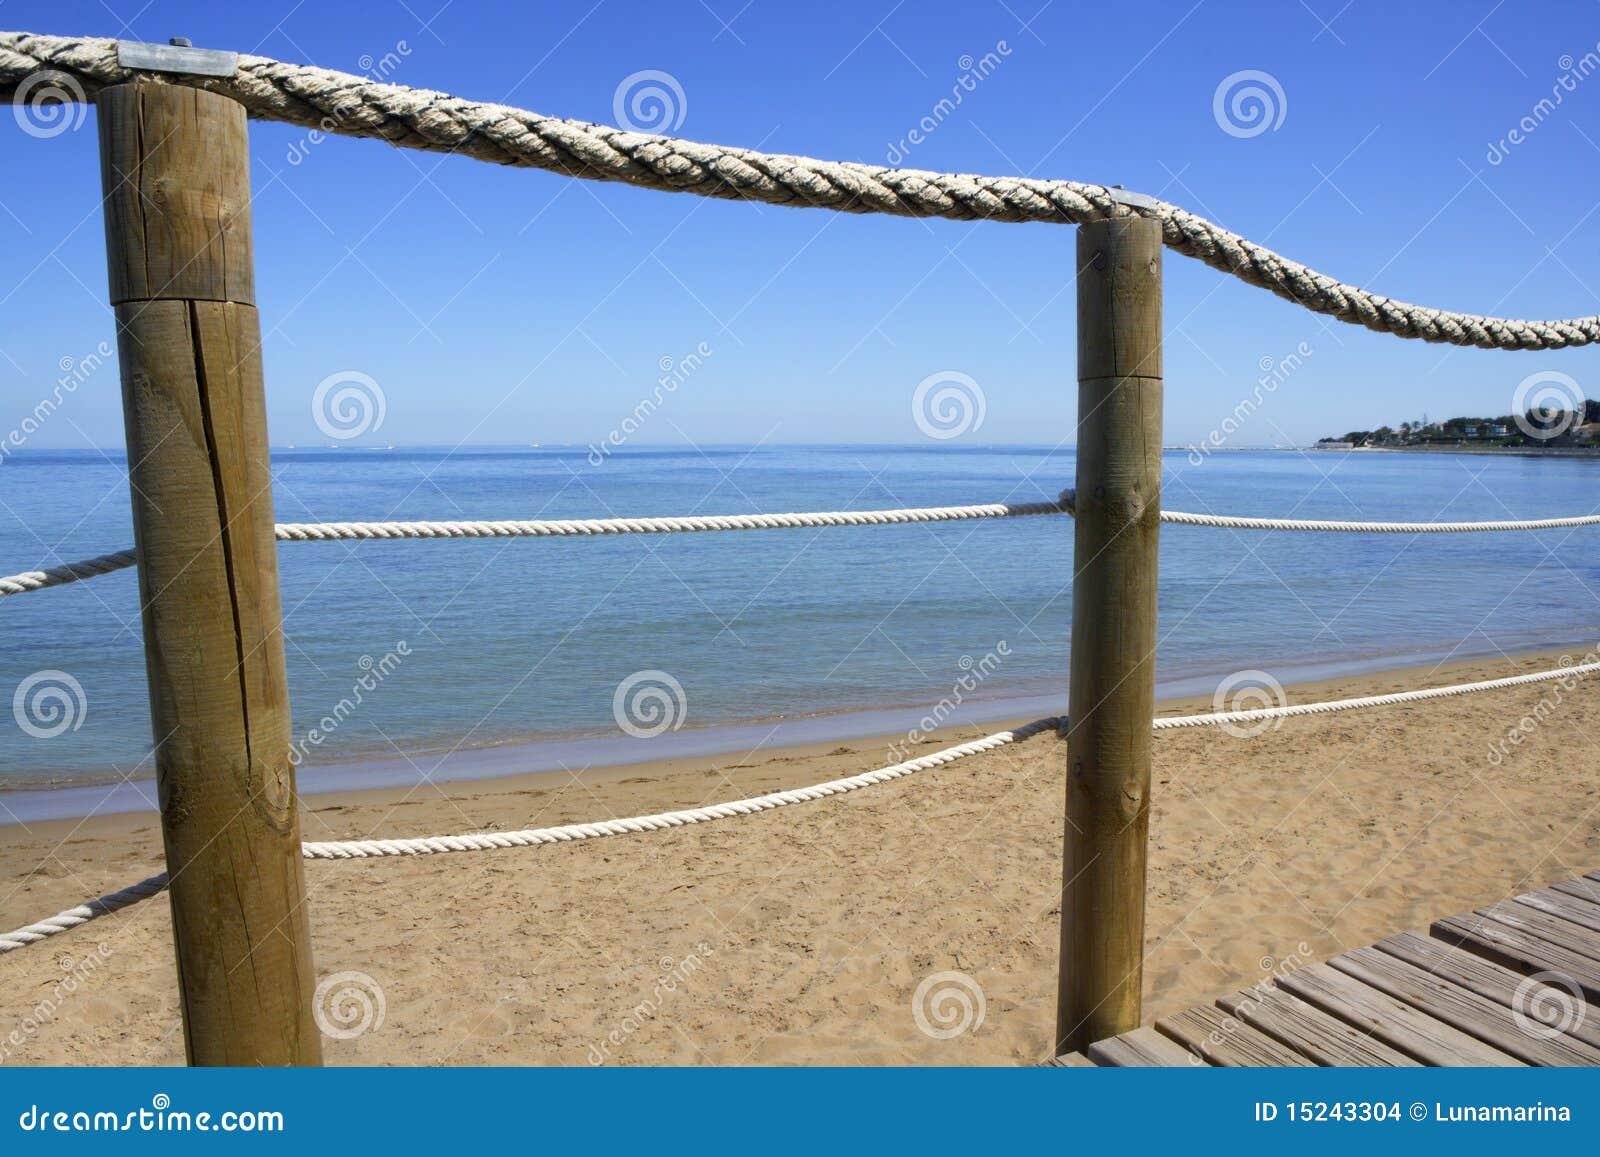 Catwalk On Wood Rope Railing On Sea Beach Stock Photo - Image of ...